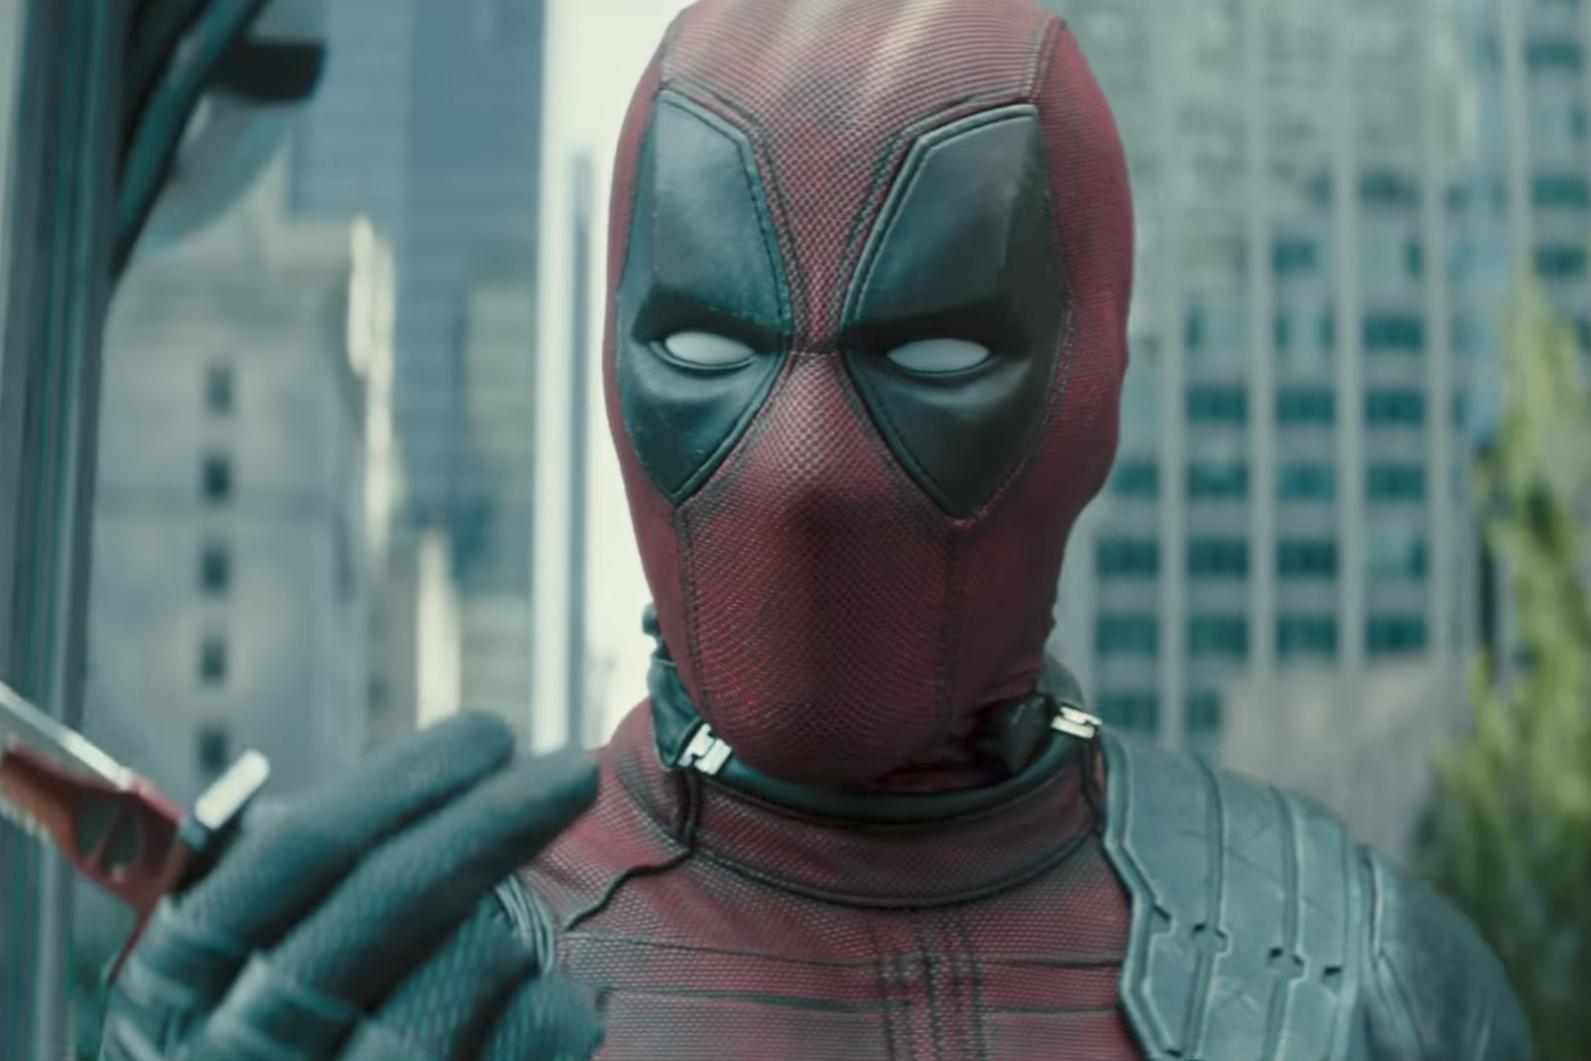 deadpool 2 full movie english subtitle free download